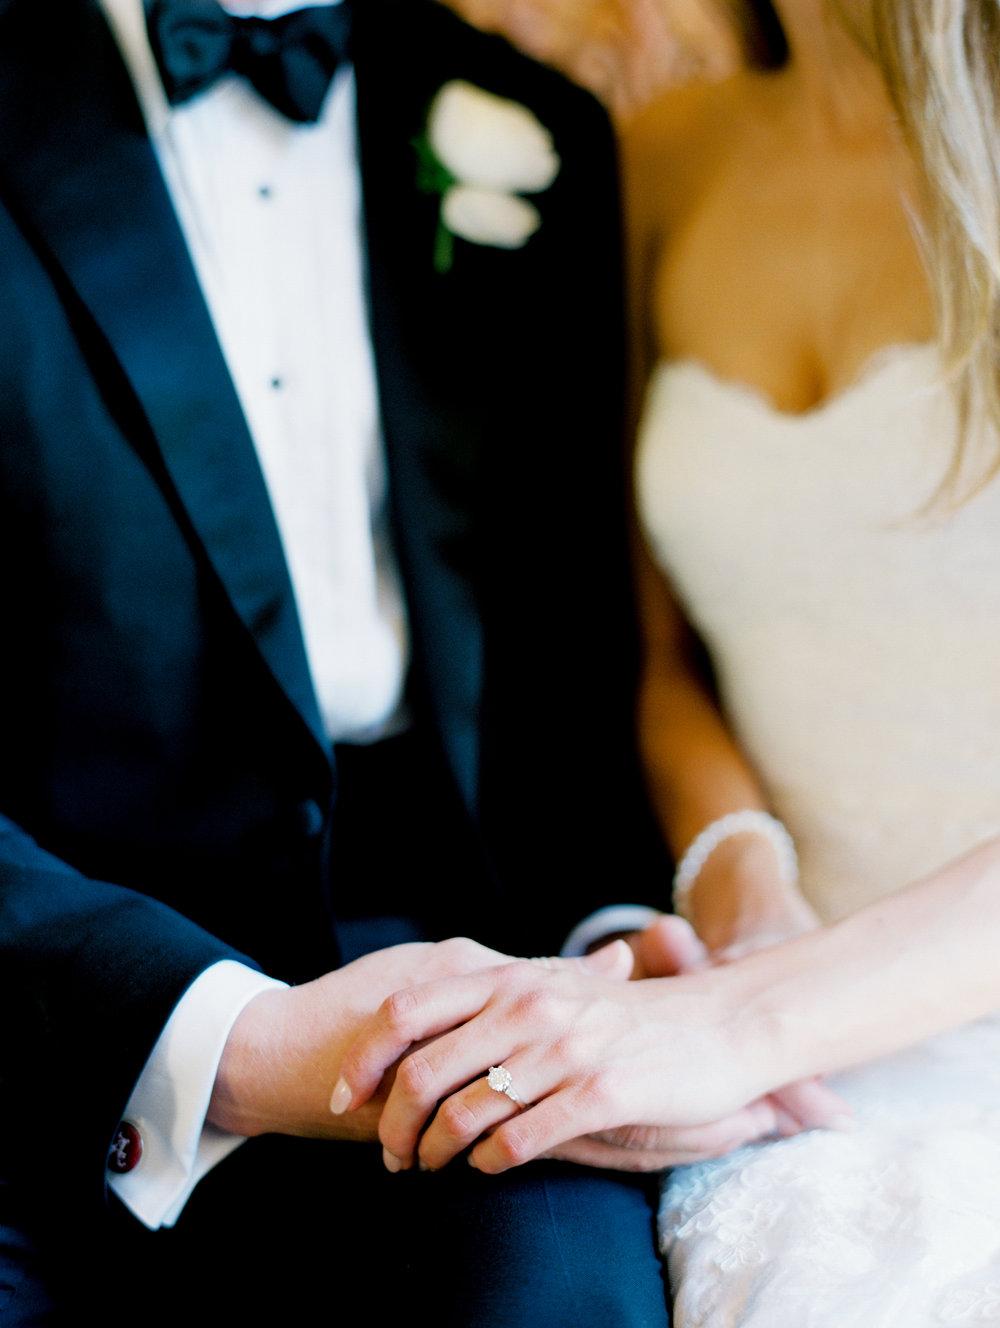 Escondido-Golf_Lake-Club-Hill-Country-Houston-Wedding-Photographer-Best-Top-Luxury-Destination-Engagements-Portrait-Austin-Photography-9.jpg